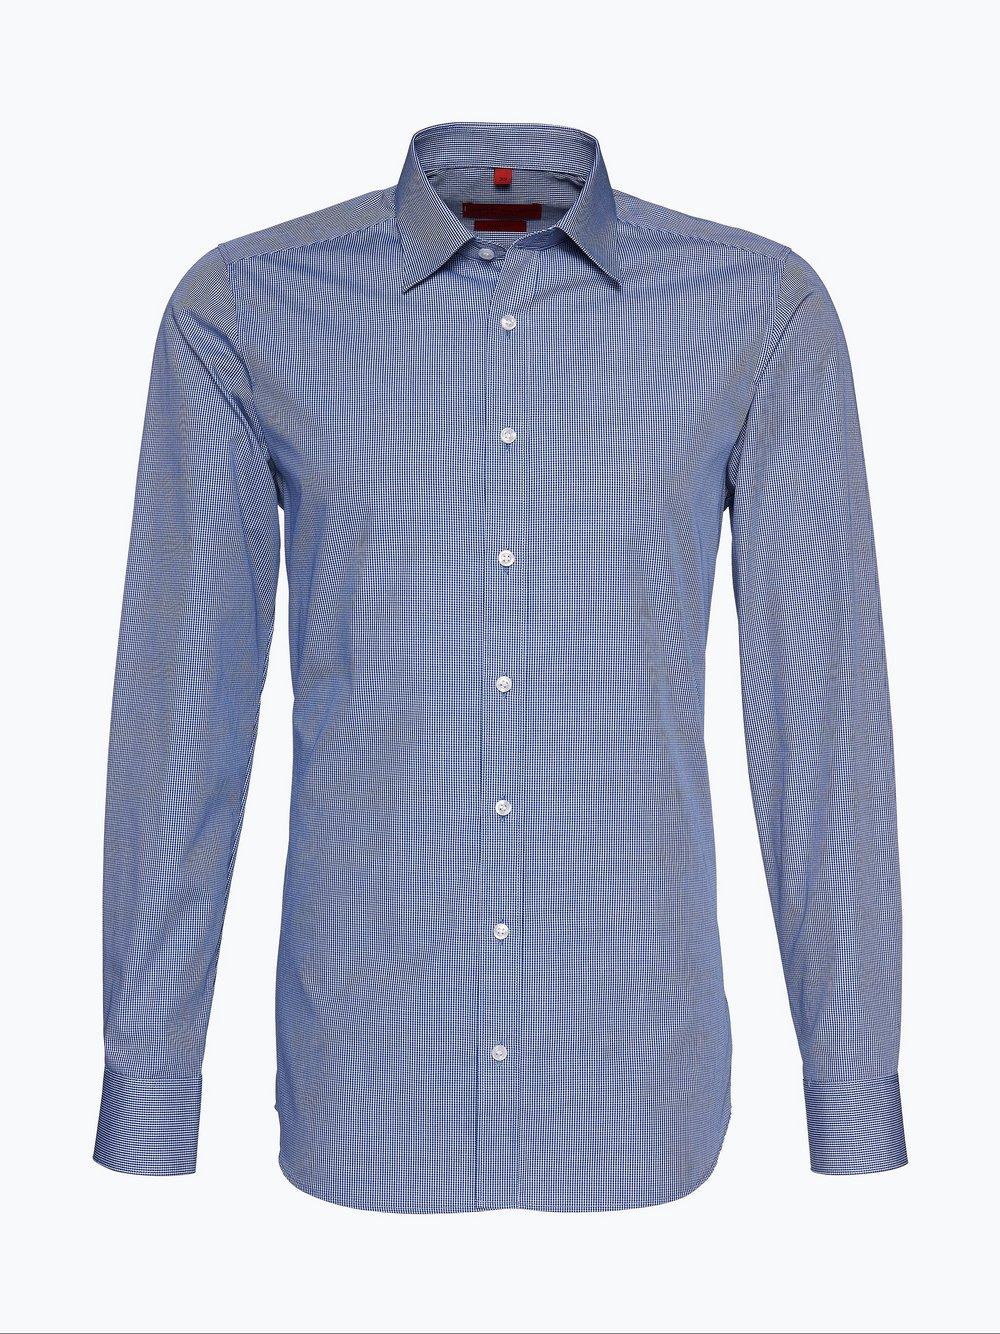 Finshley & Harding - Koszula męska, niebieski